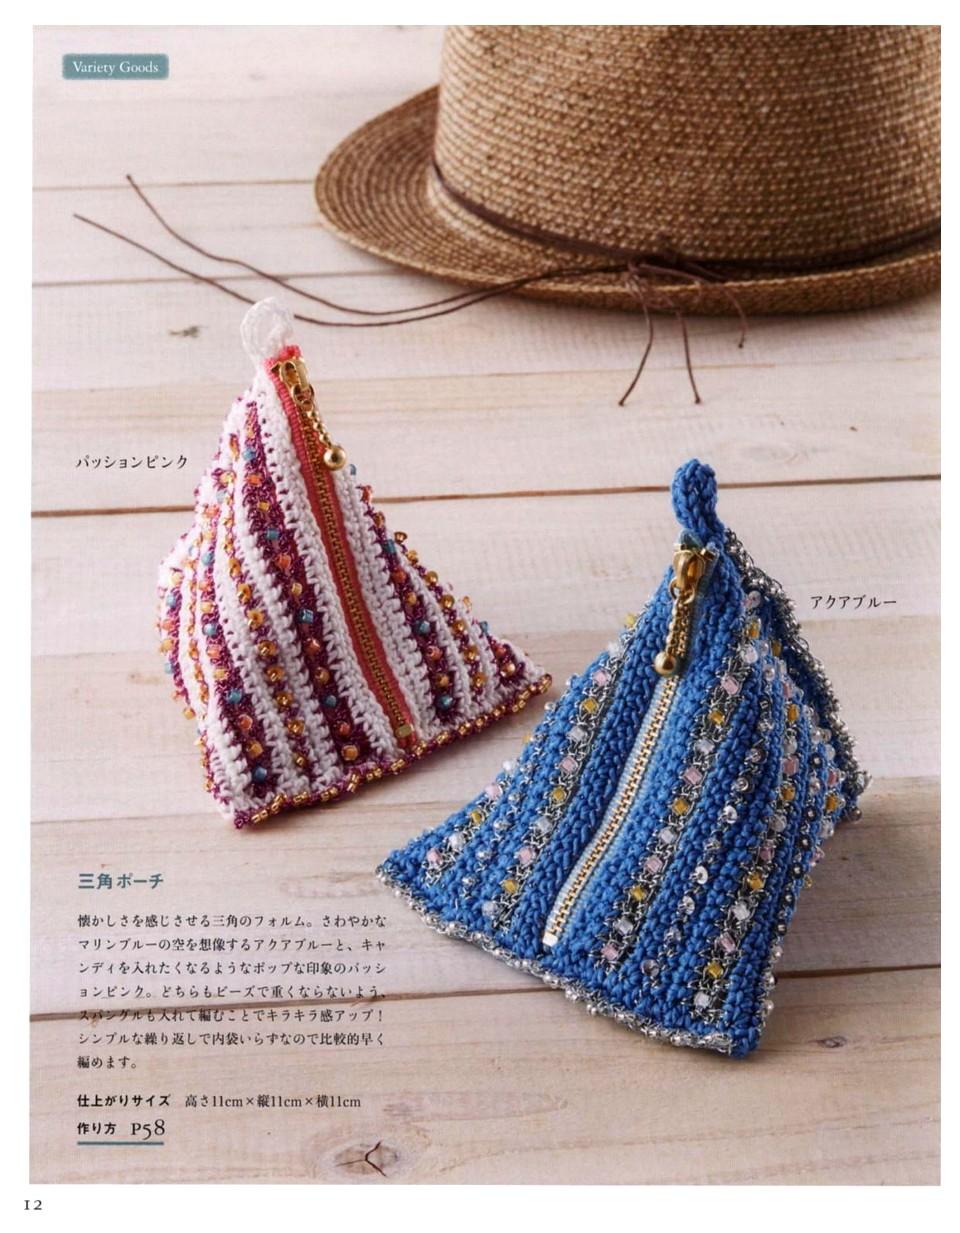 717 Beads Crochet 17-13